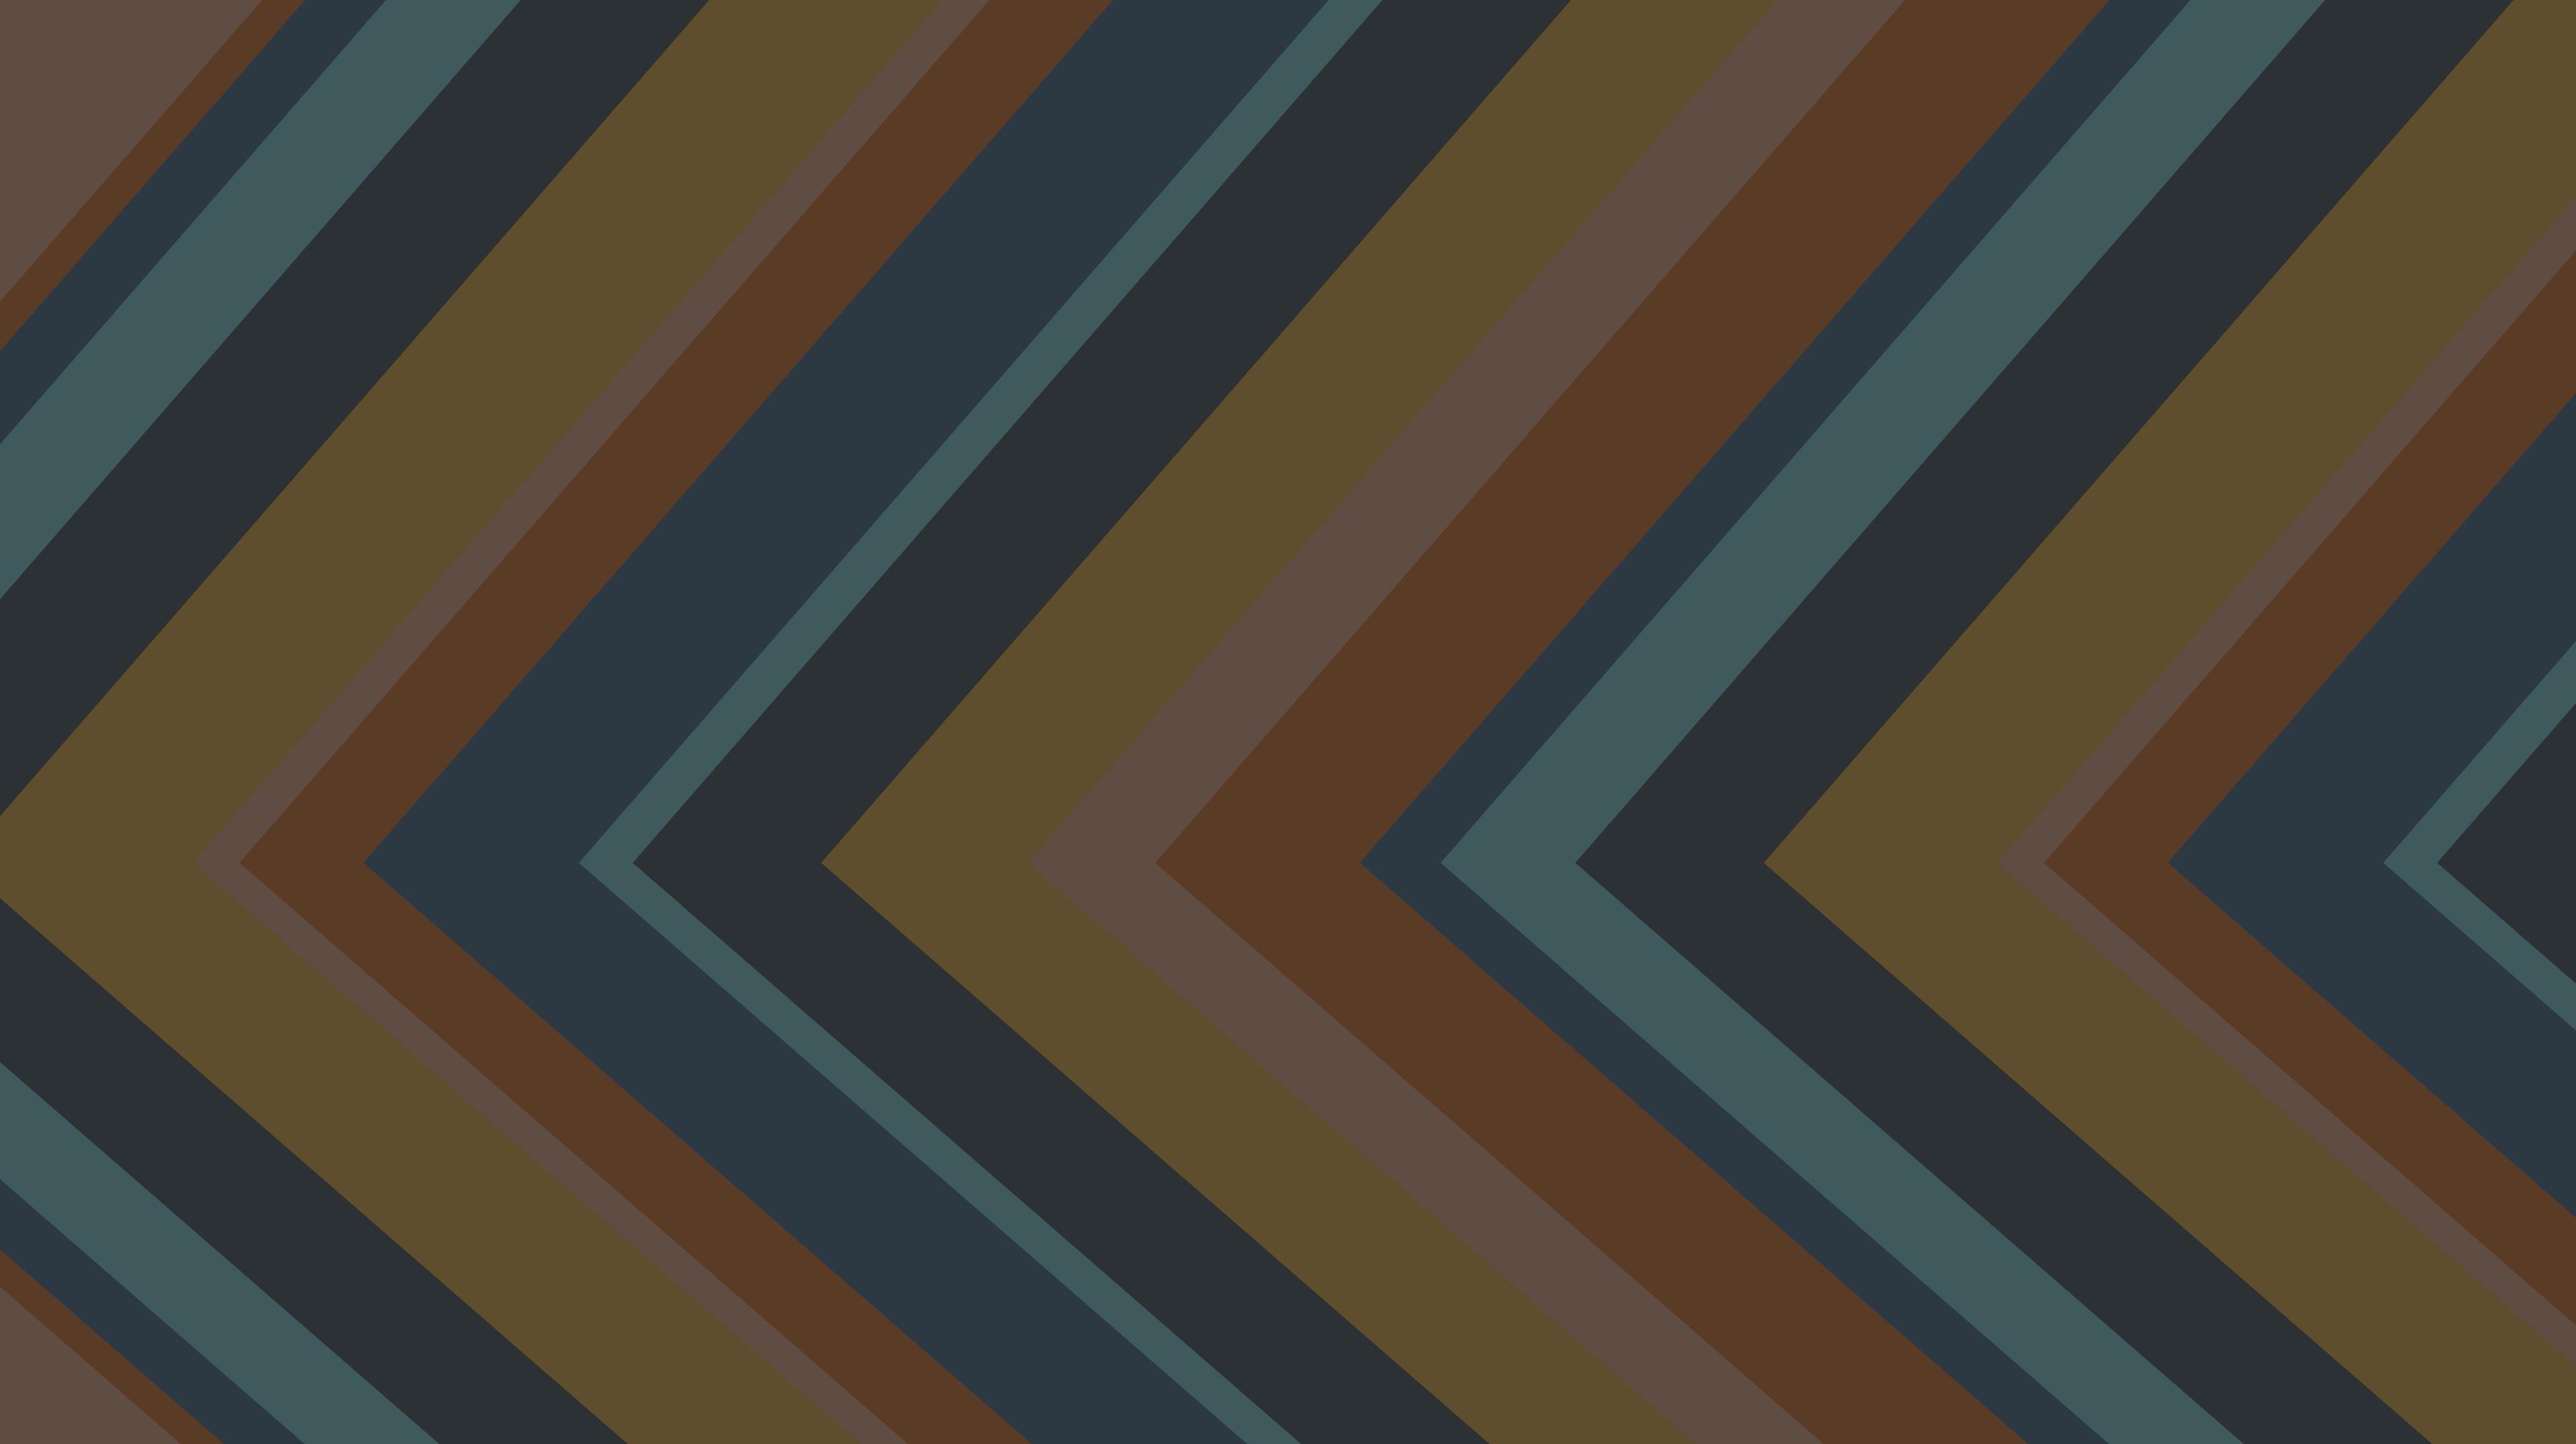 Motion Set 3 // Motion Backgrounds